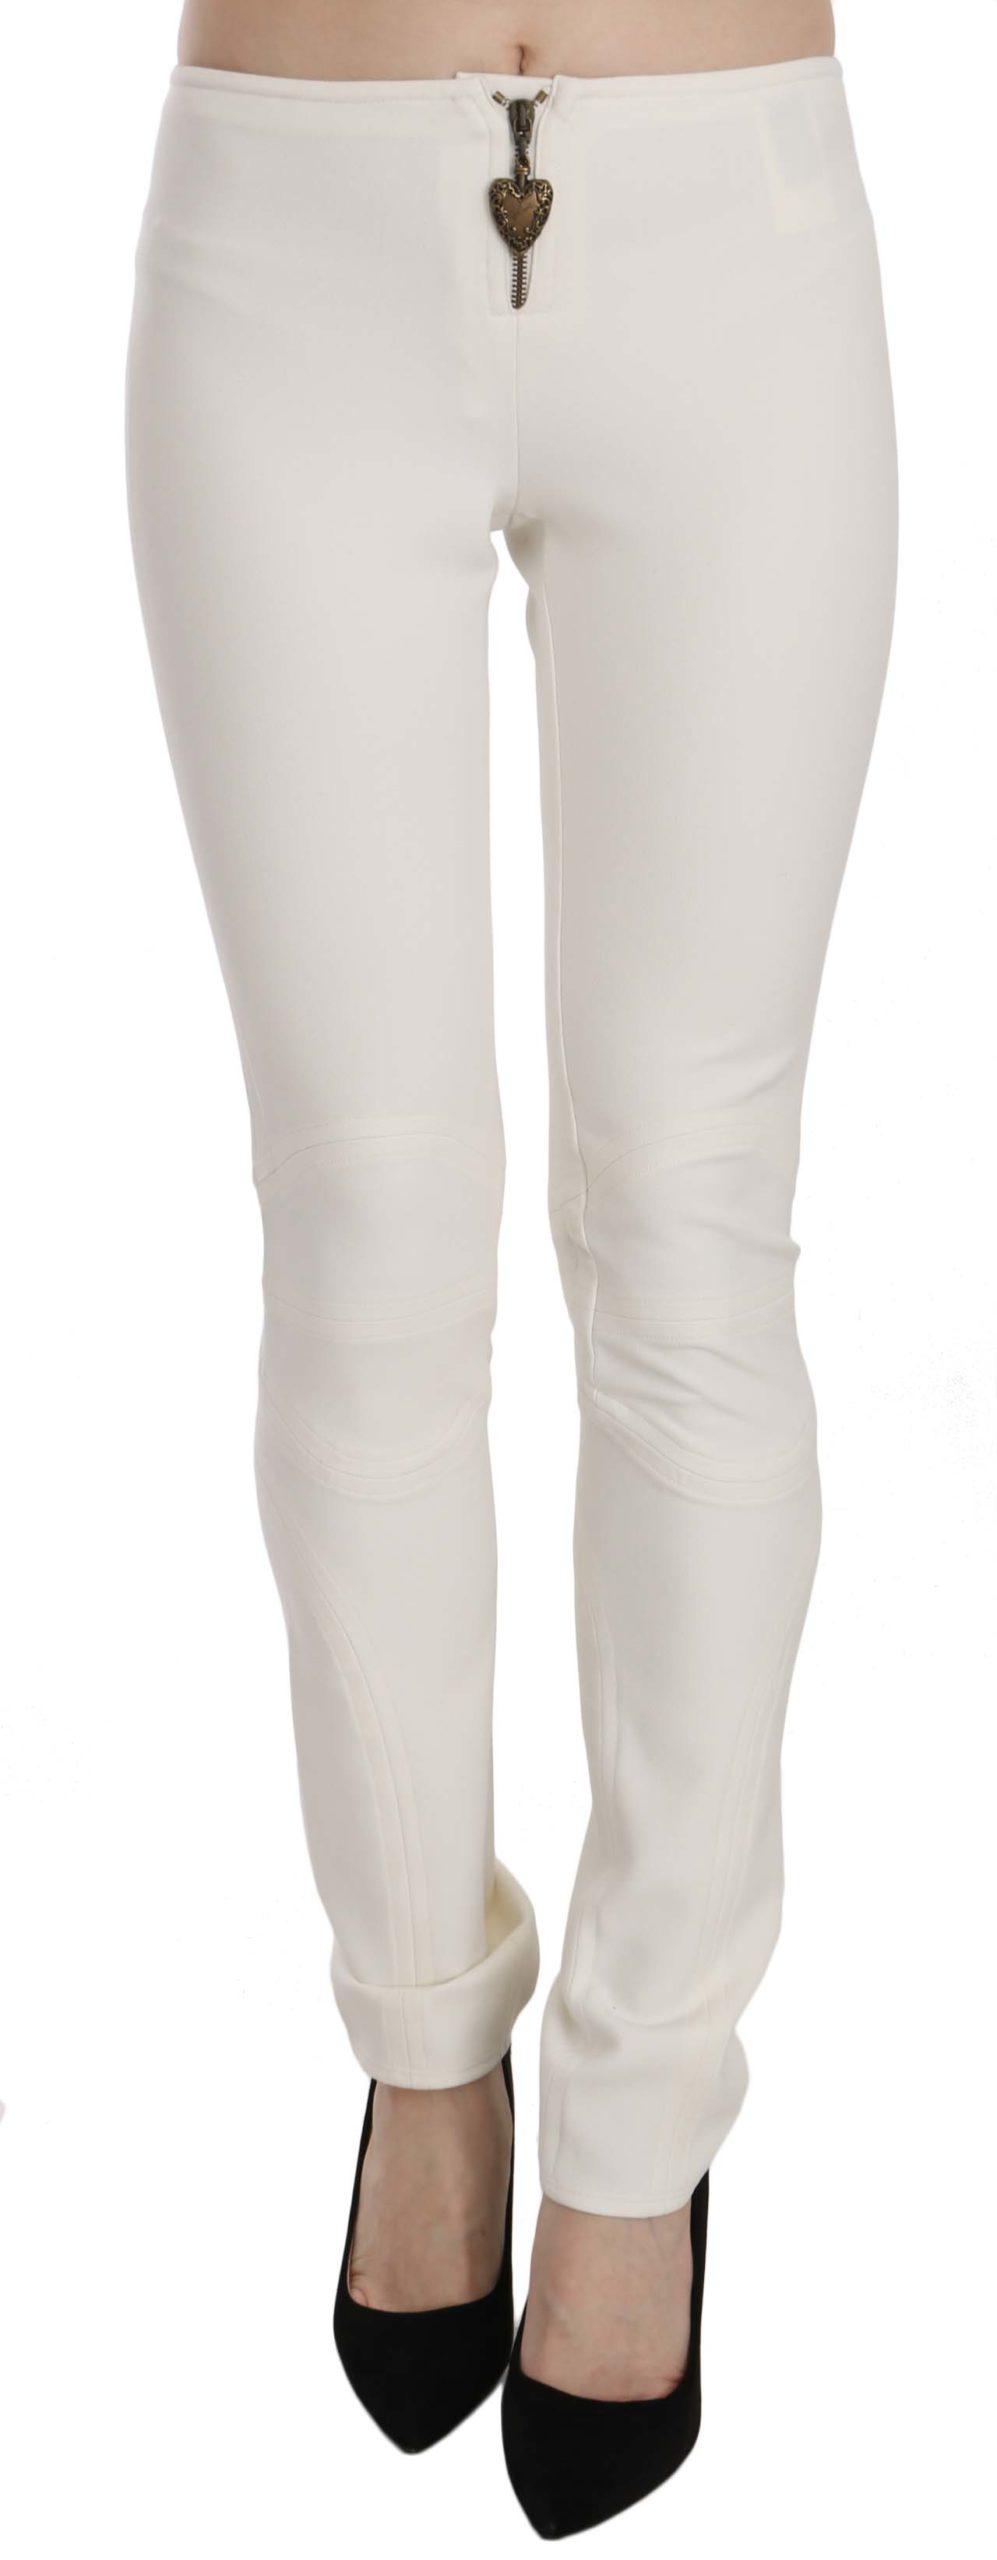 Just Cavalli Women's Mid Waist Skinny Dress Trouser White PAN70376 - IT38 XS